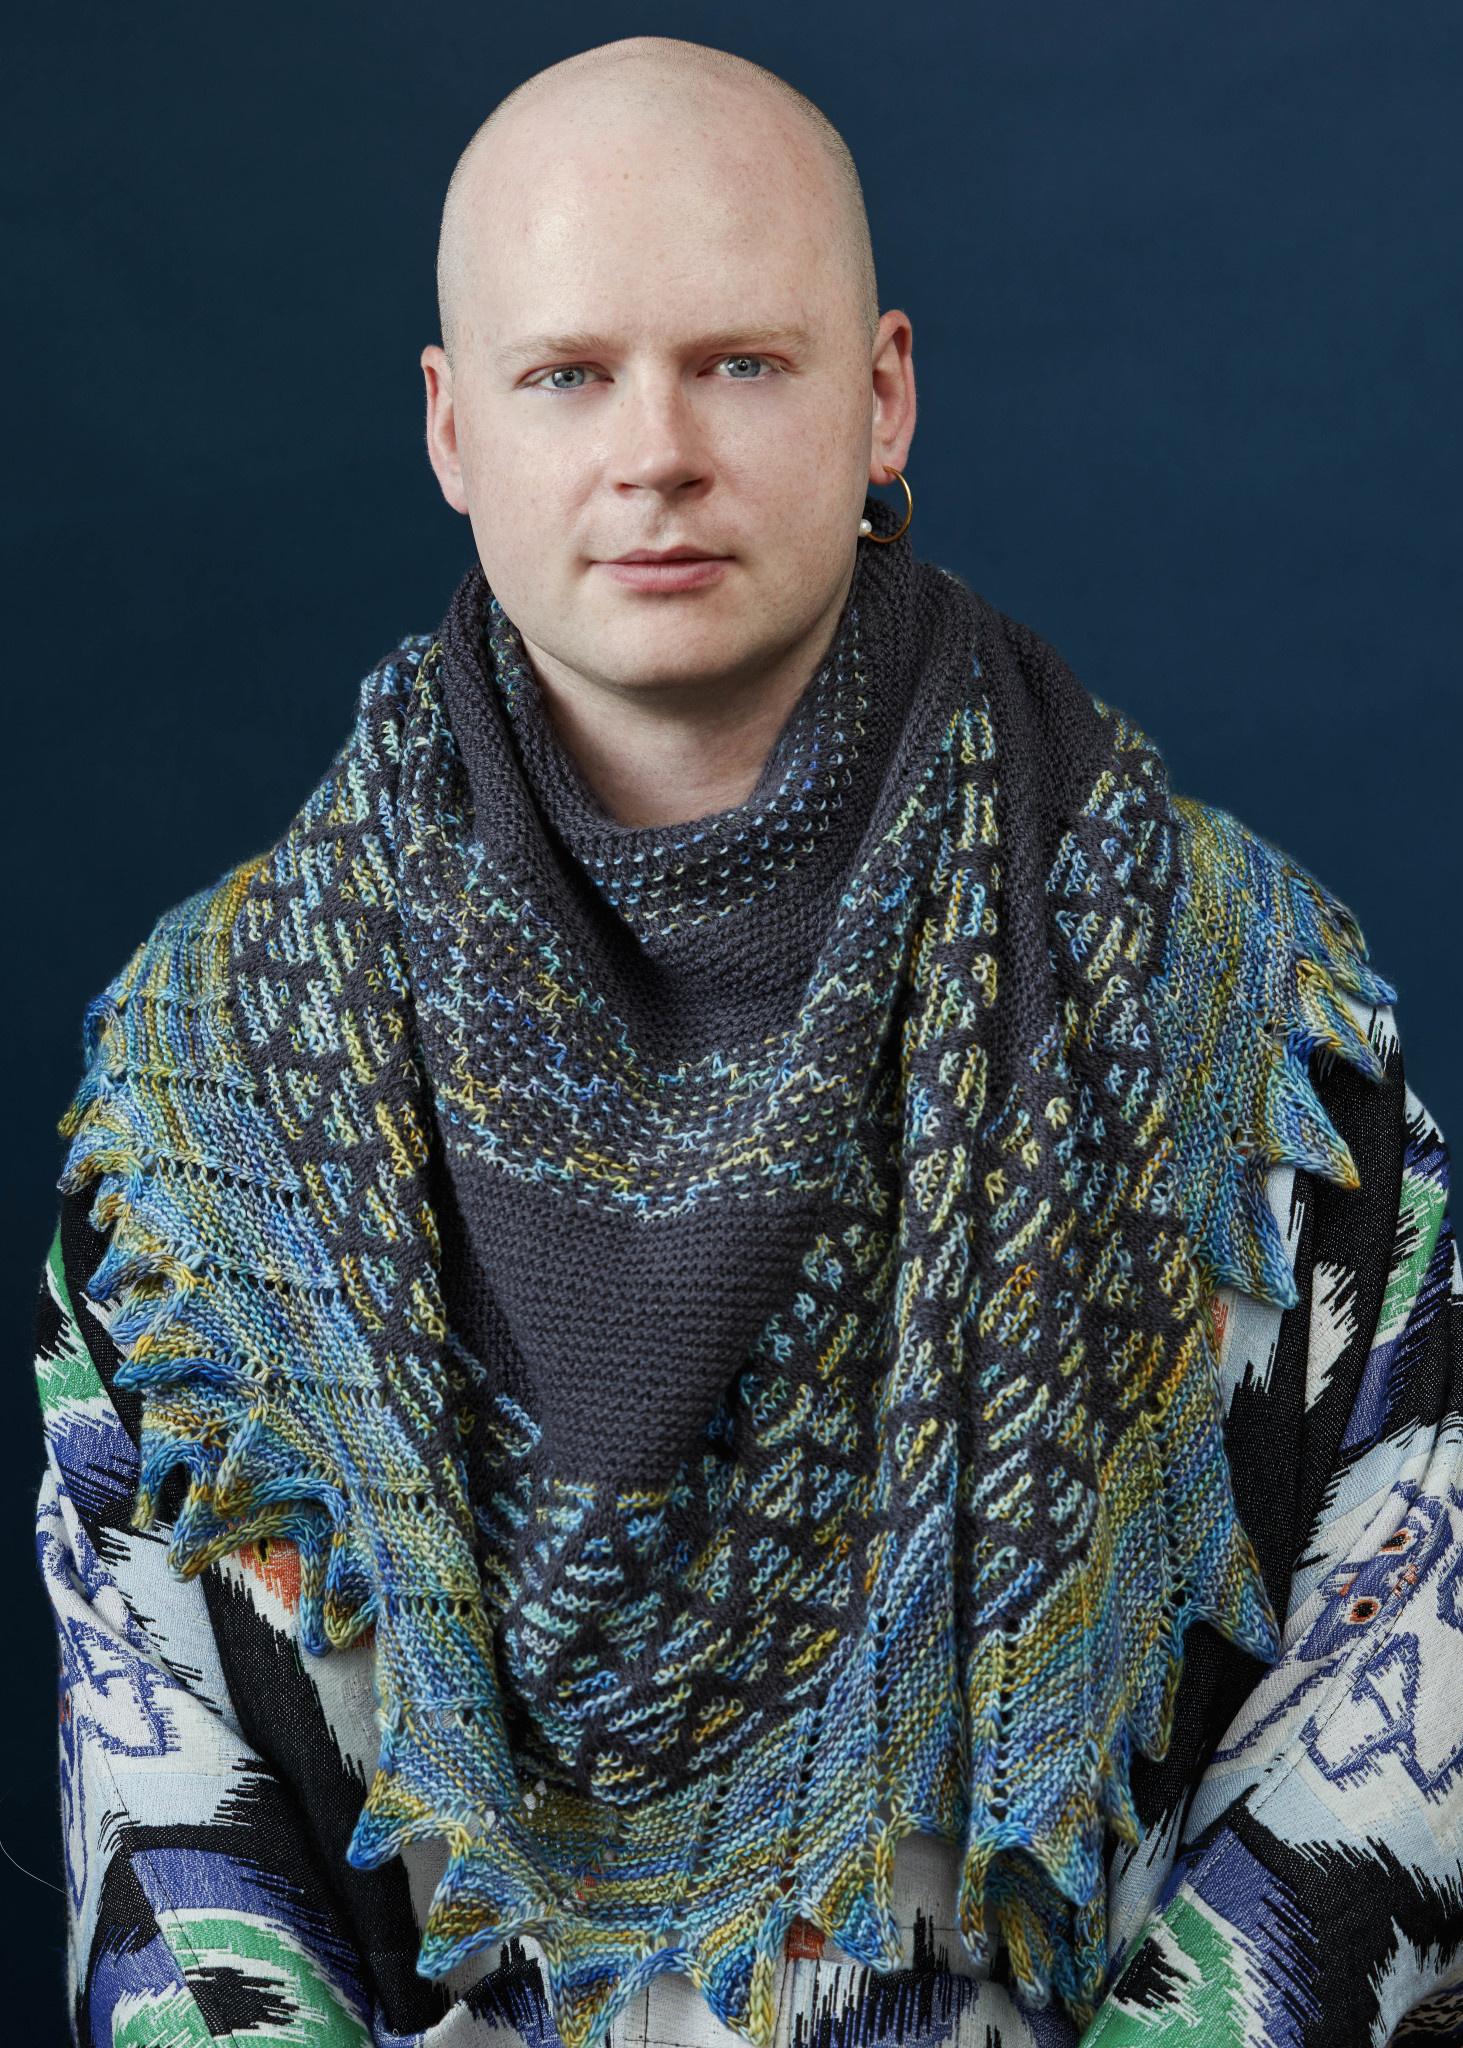 Westknits WESTKNITS KIT MOSAIC MUSINGS - AQUA